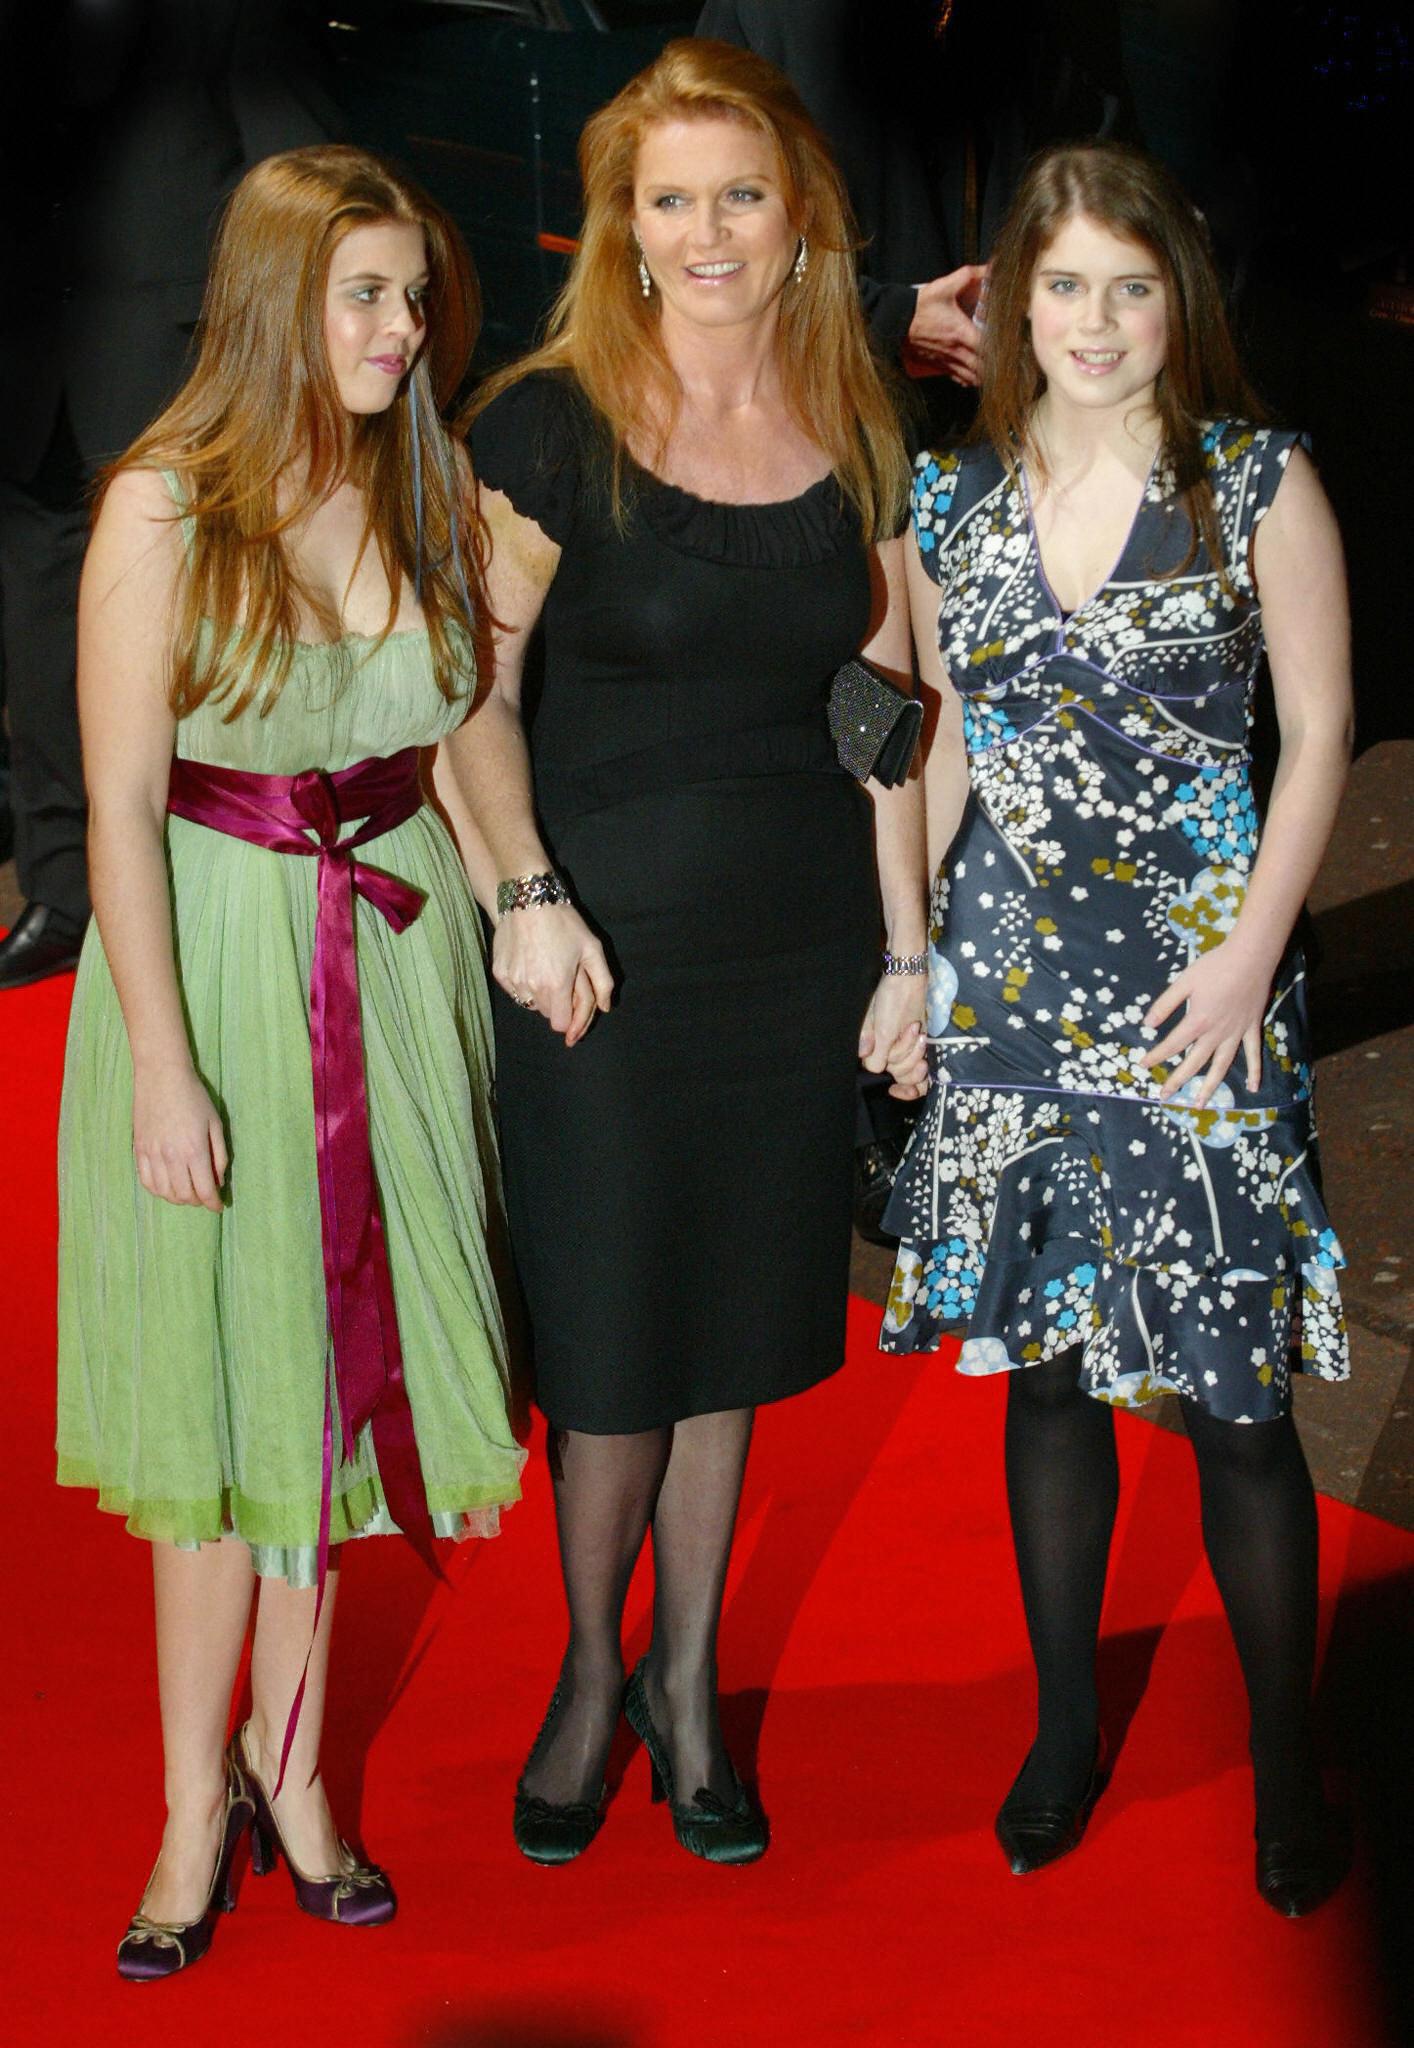 Sarah Ferguson, Princess Beatrice, and Princess Eugenie arrive on the red carpet.